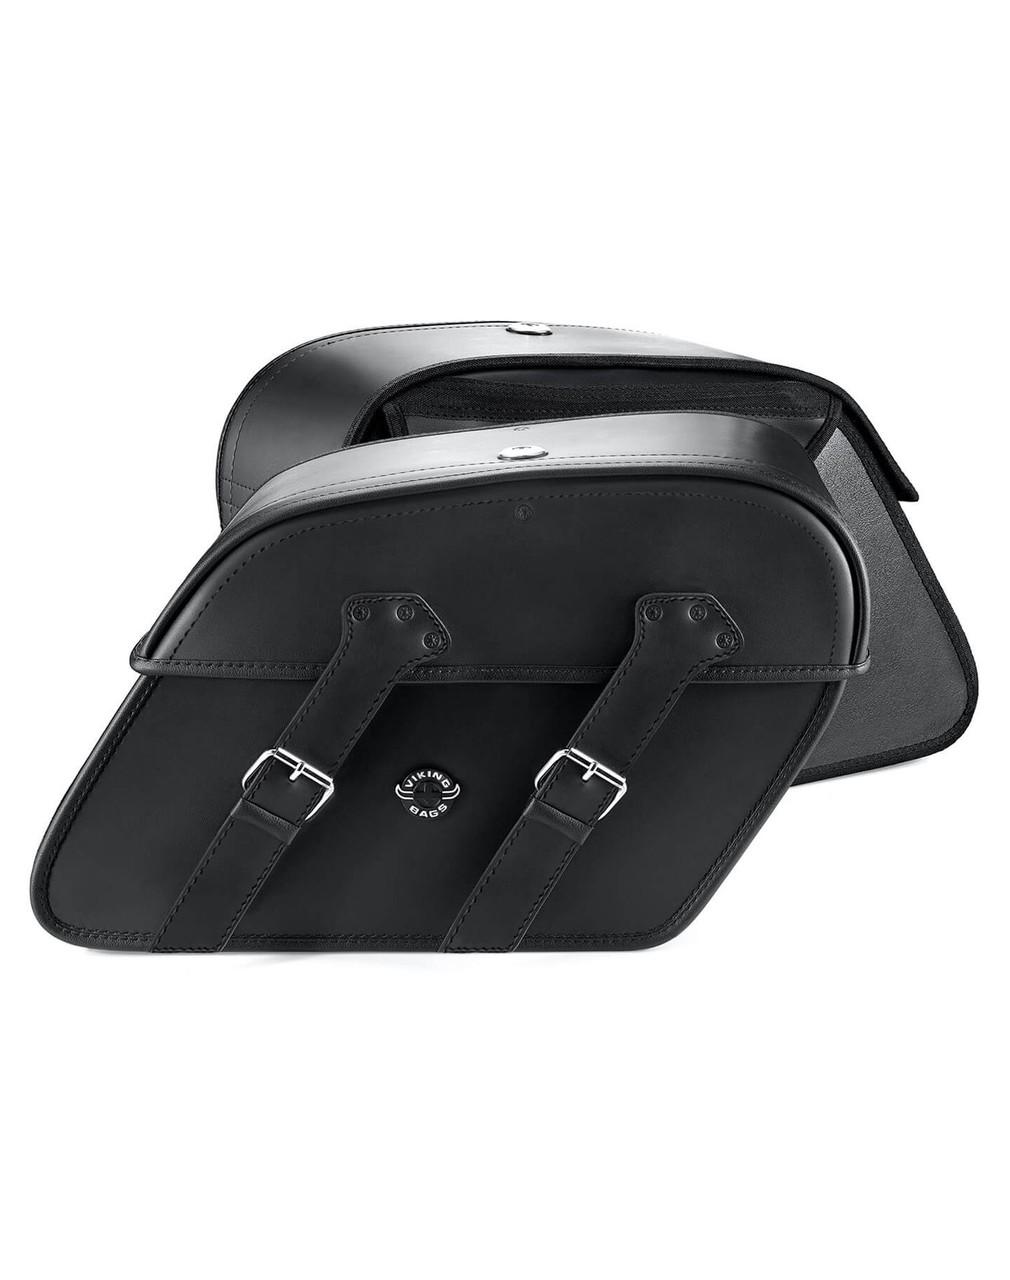 Honda 600 Shadow VLX Viking Raven Medium Leather Motorcycle Saddlebags both bags view